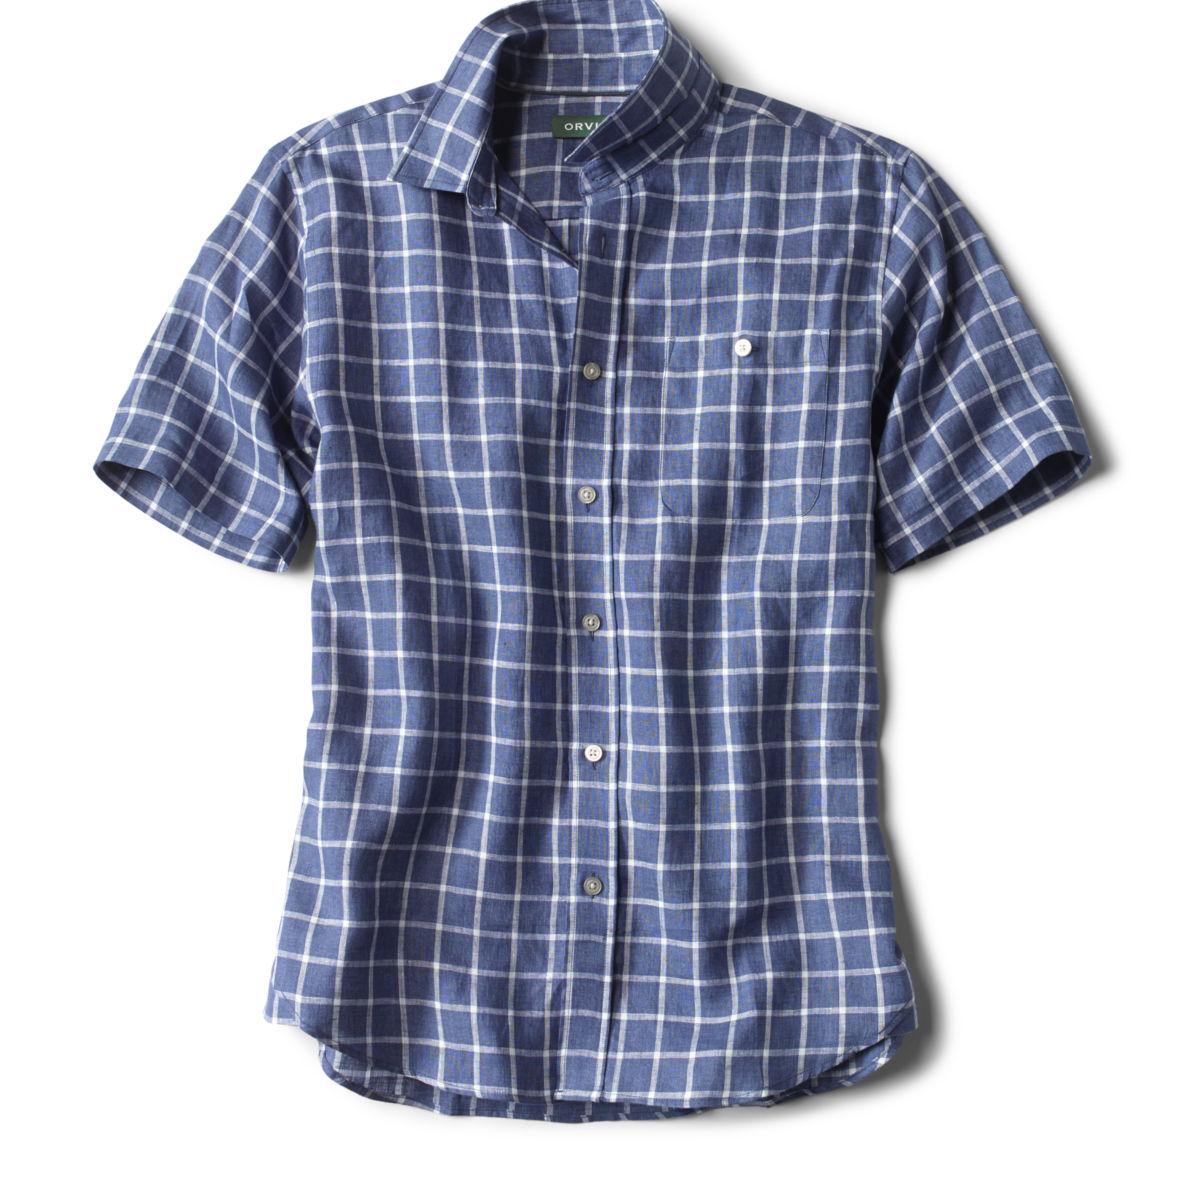 Flyweight Linen Shirt - WHITE/BLUEimage number 0